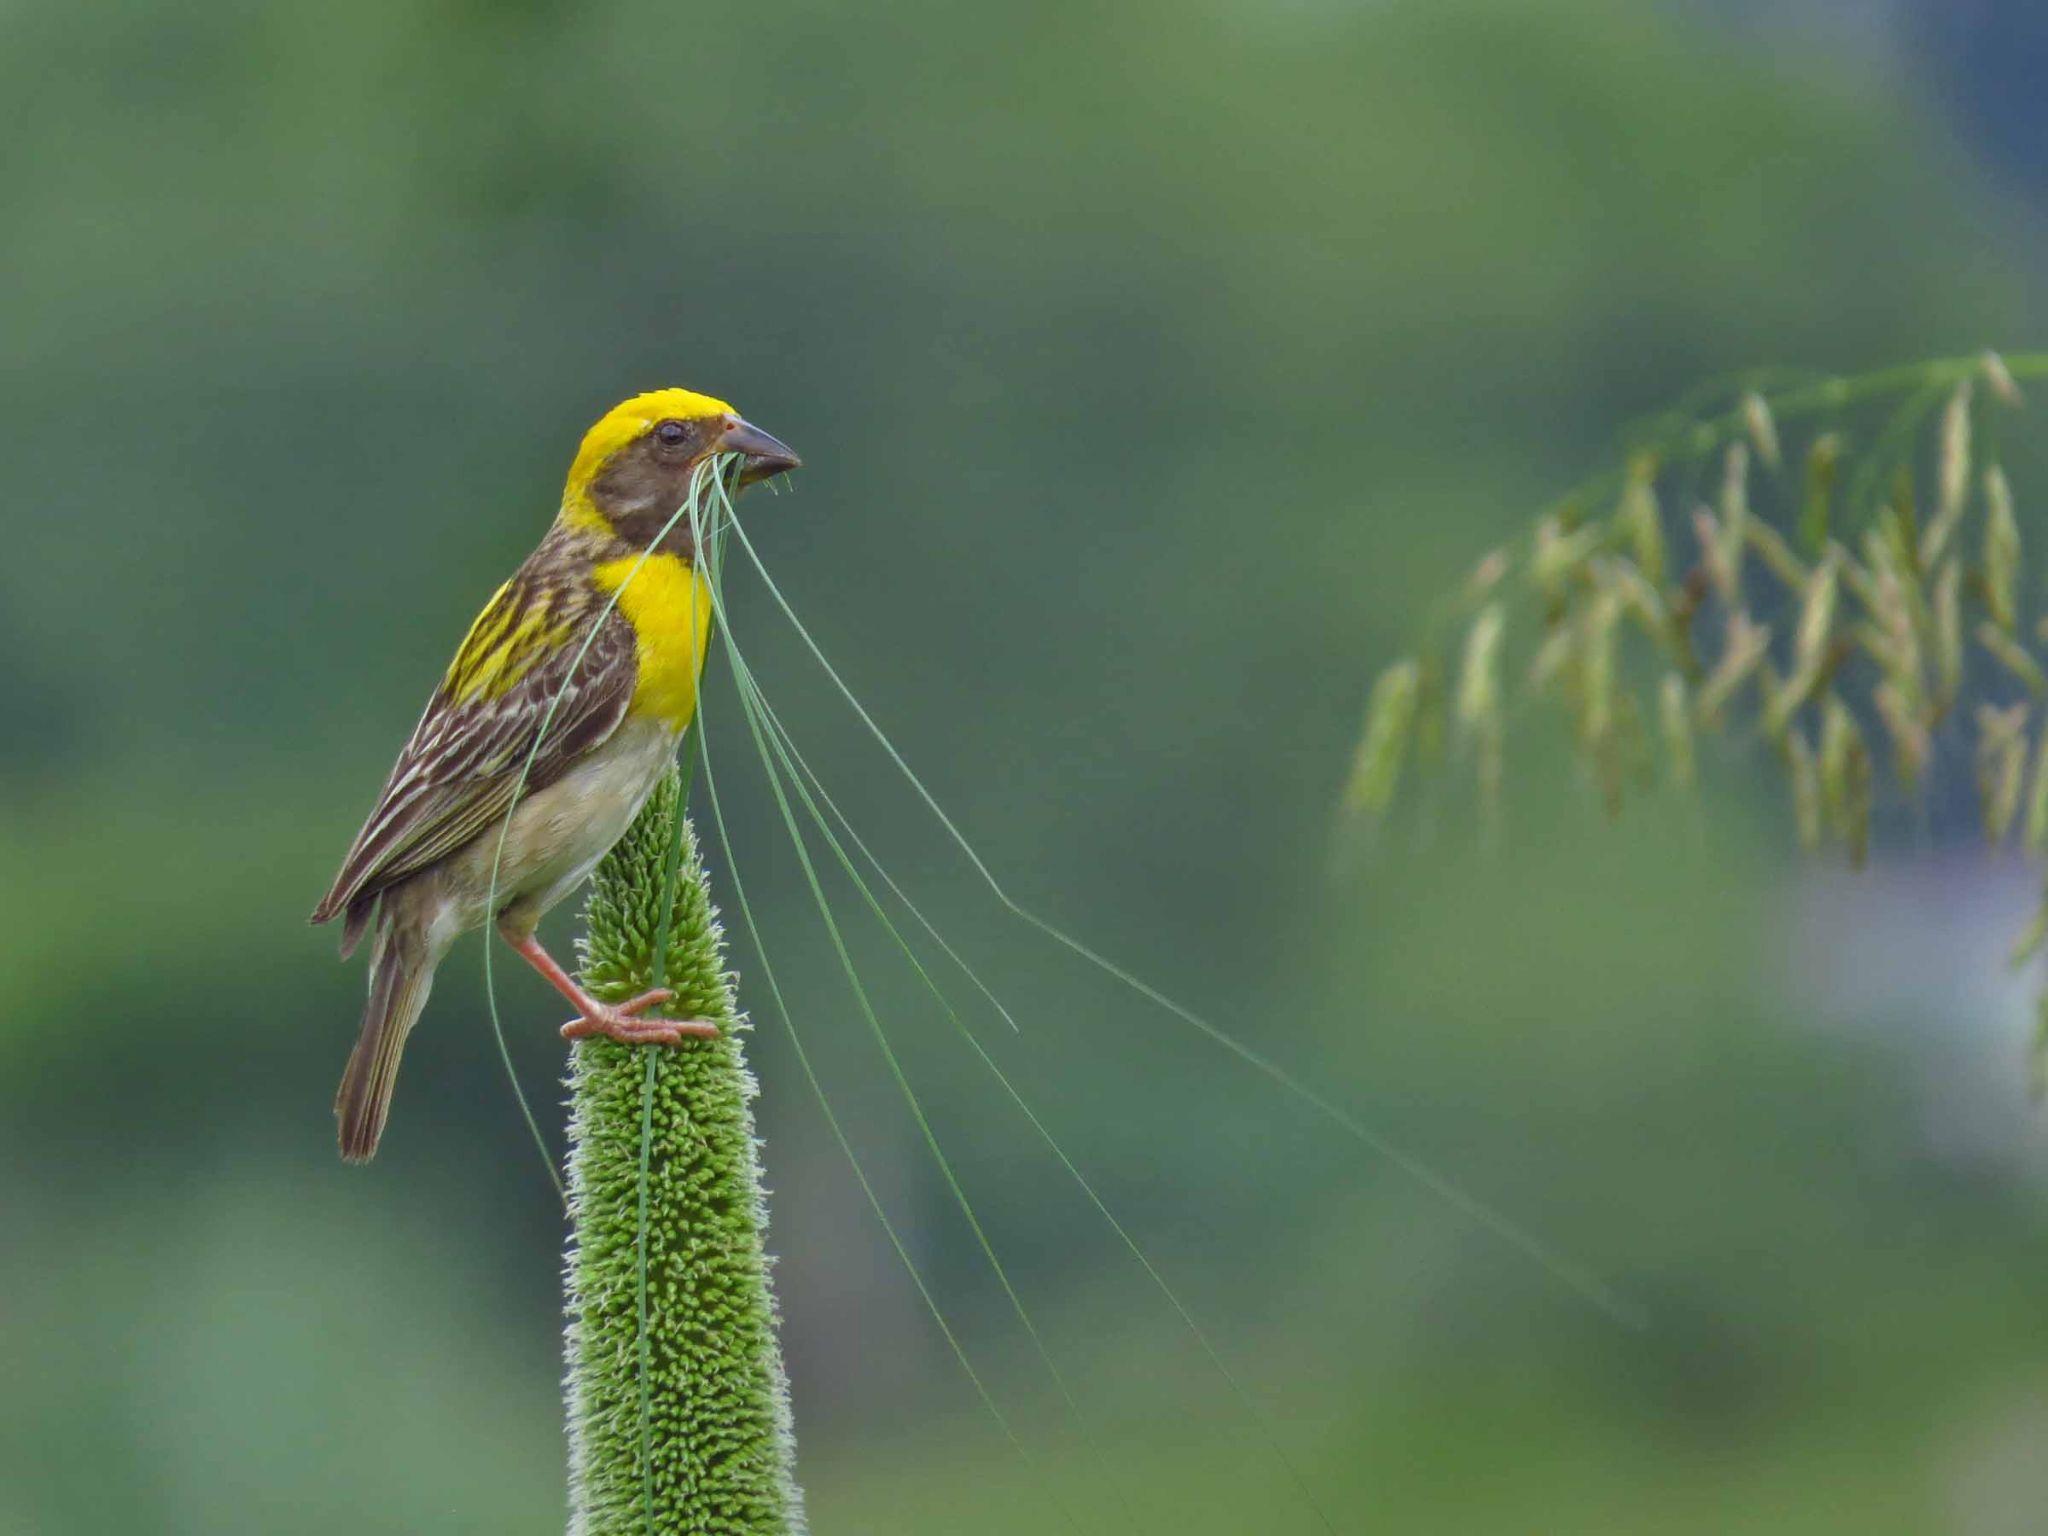 Nesting time by Kishan Meena